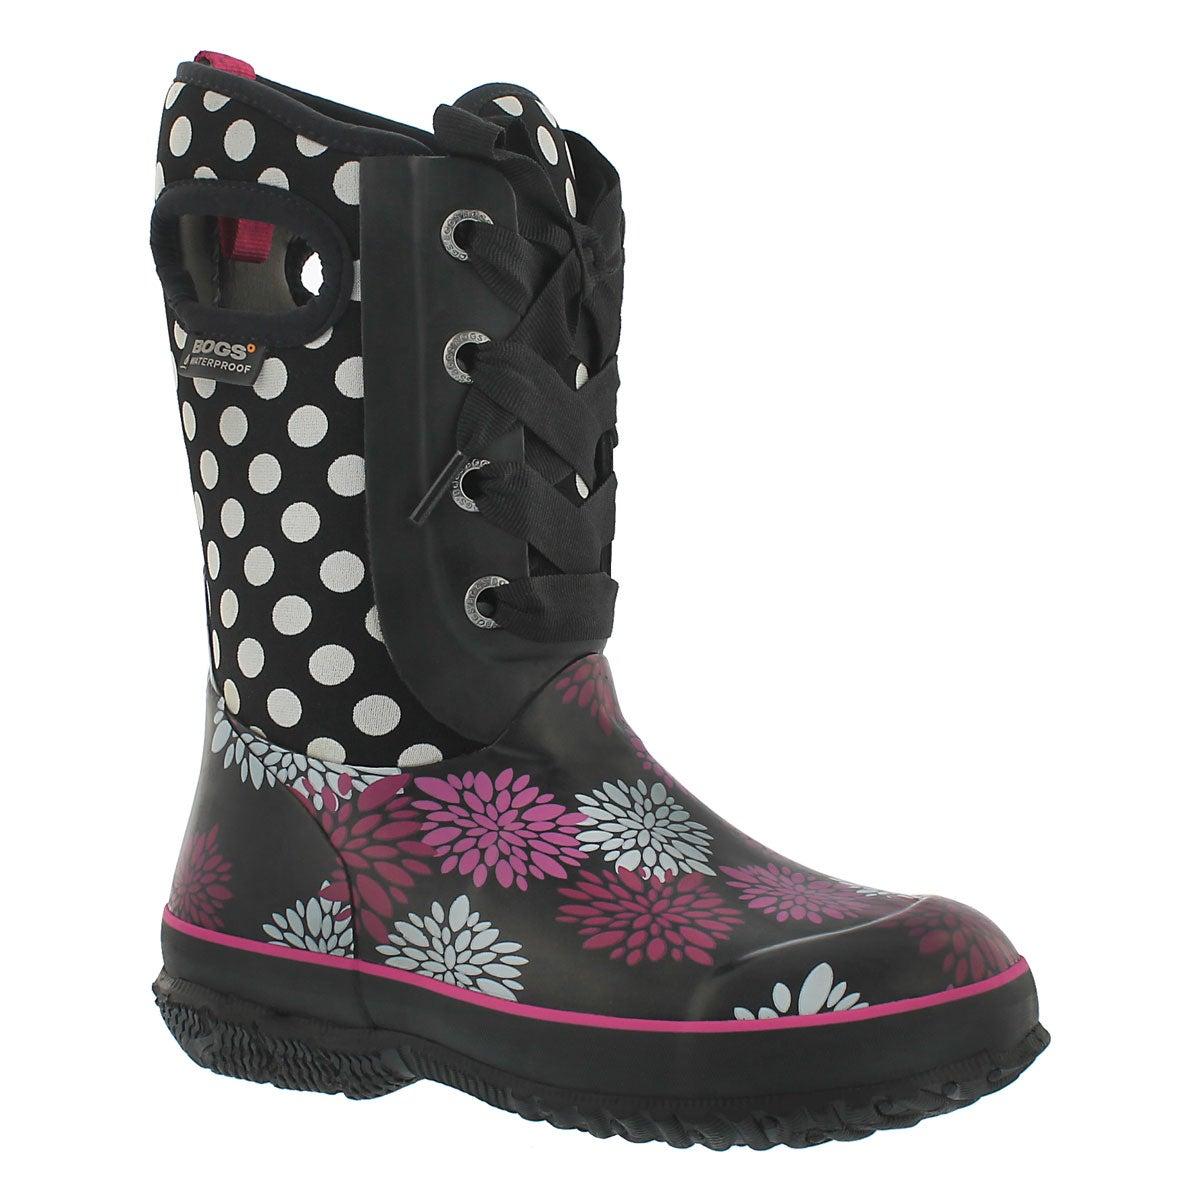 Grls Casey Pompons Dots black wtpf boot